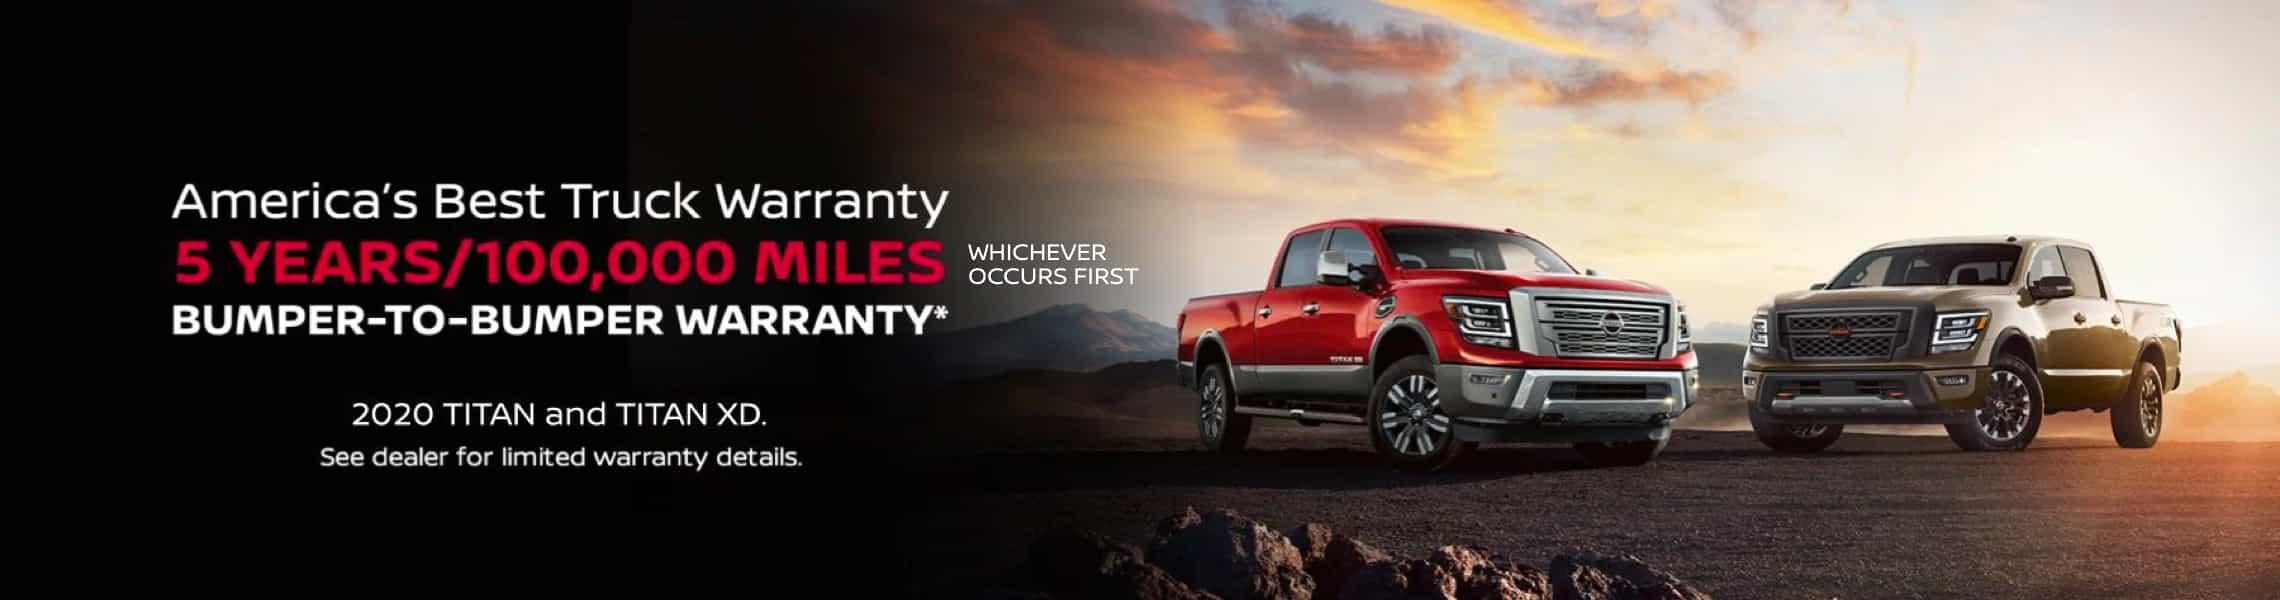 Nissan Best Truck Warranty Banner